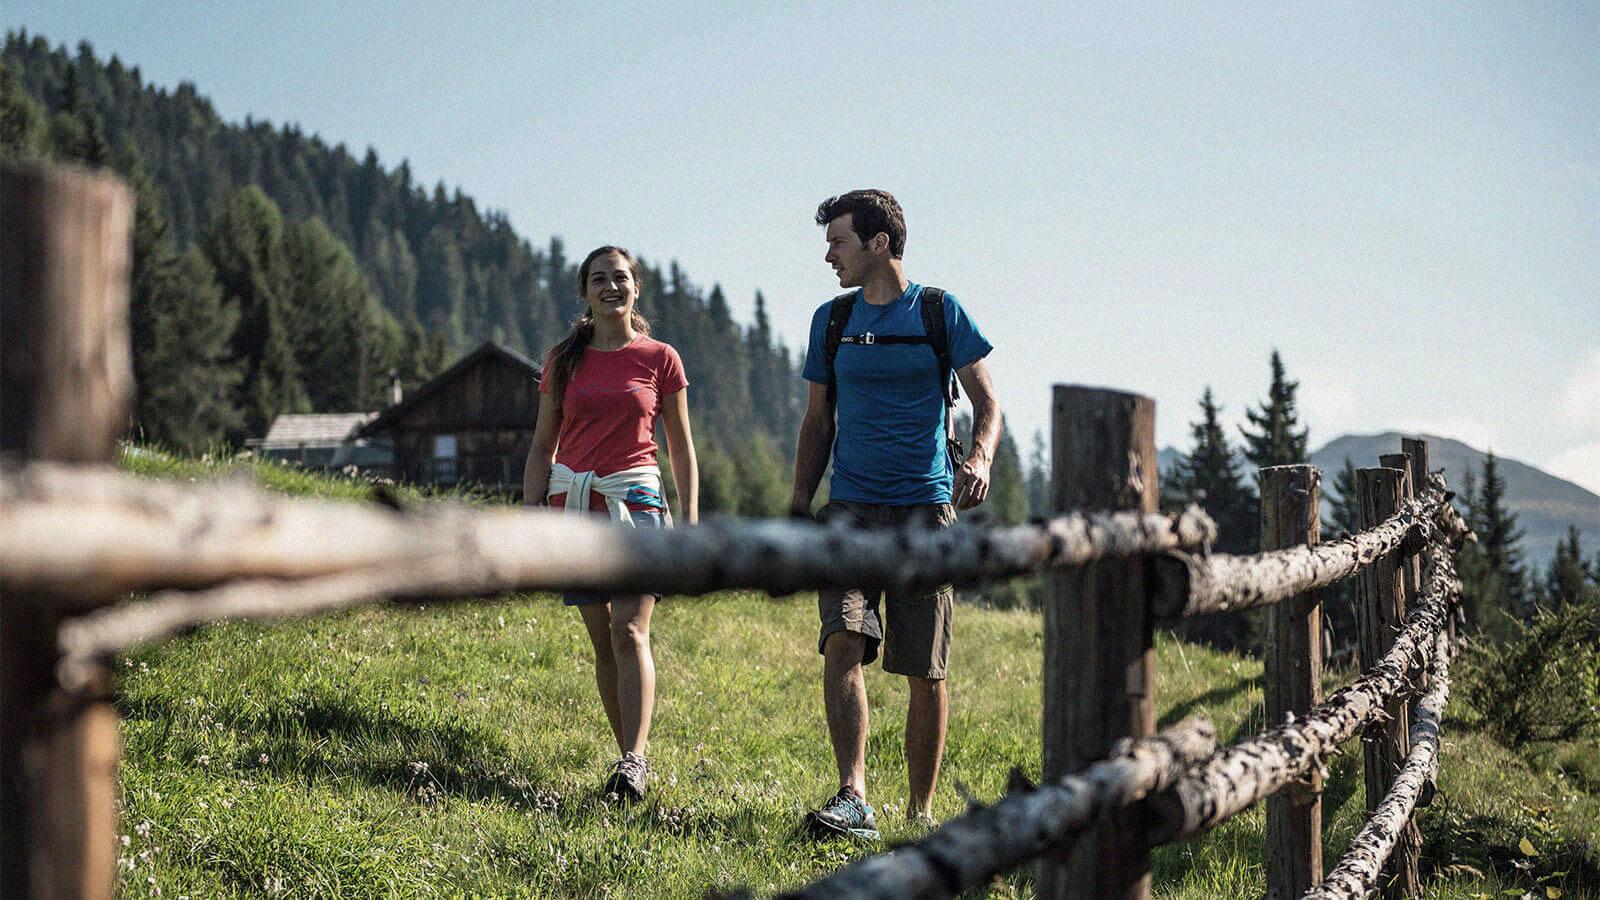 Wanderurlaub & Klettern im Pustertal - Hotel Terentnerhof